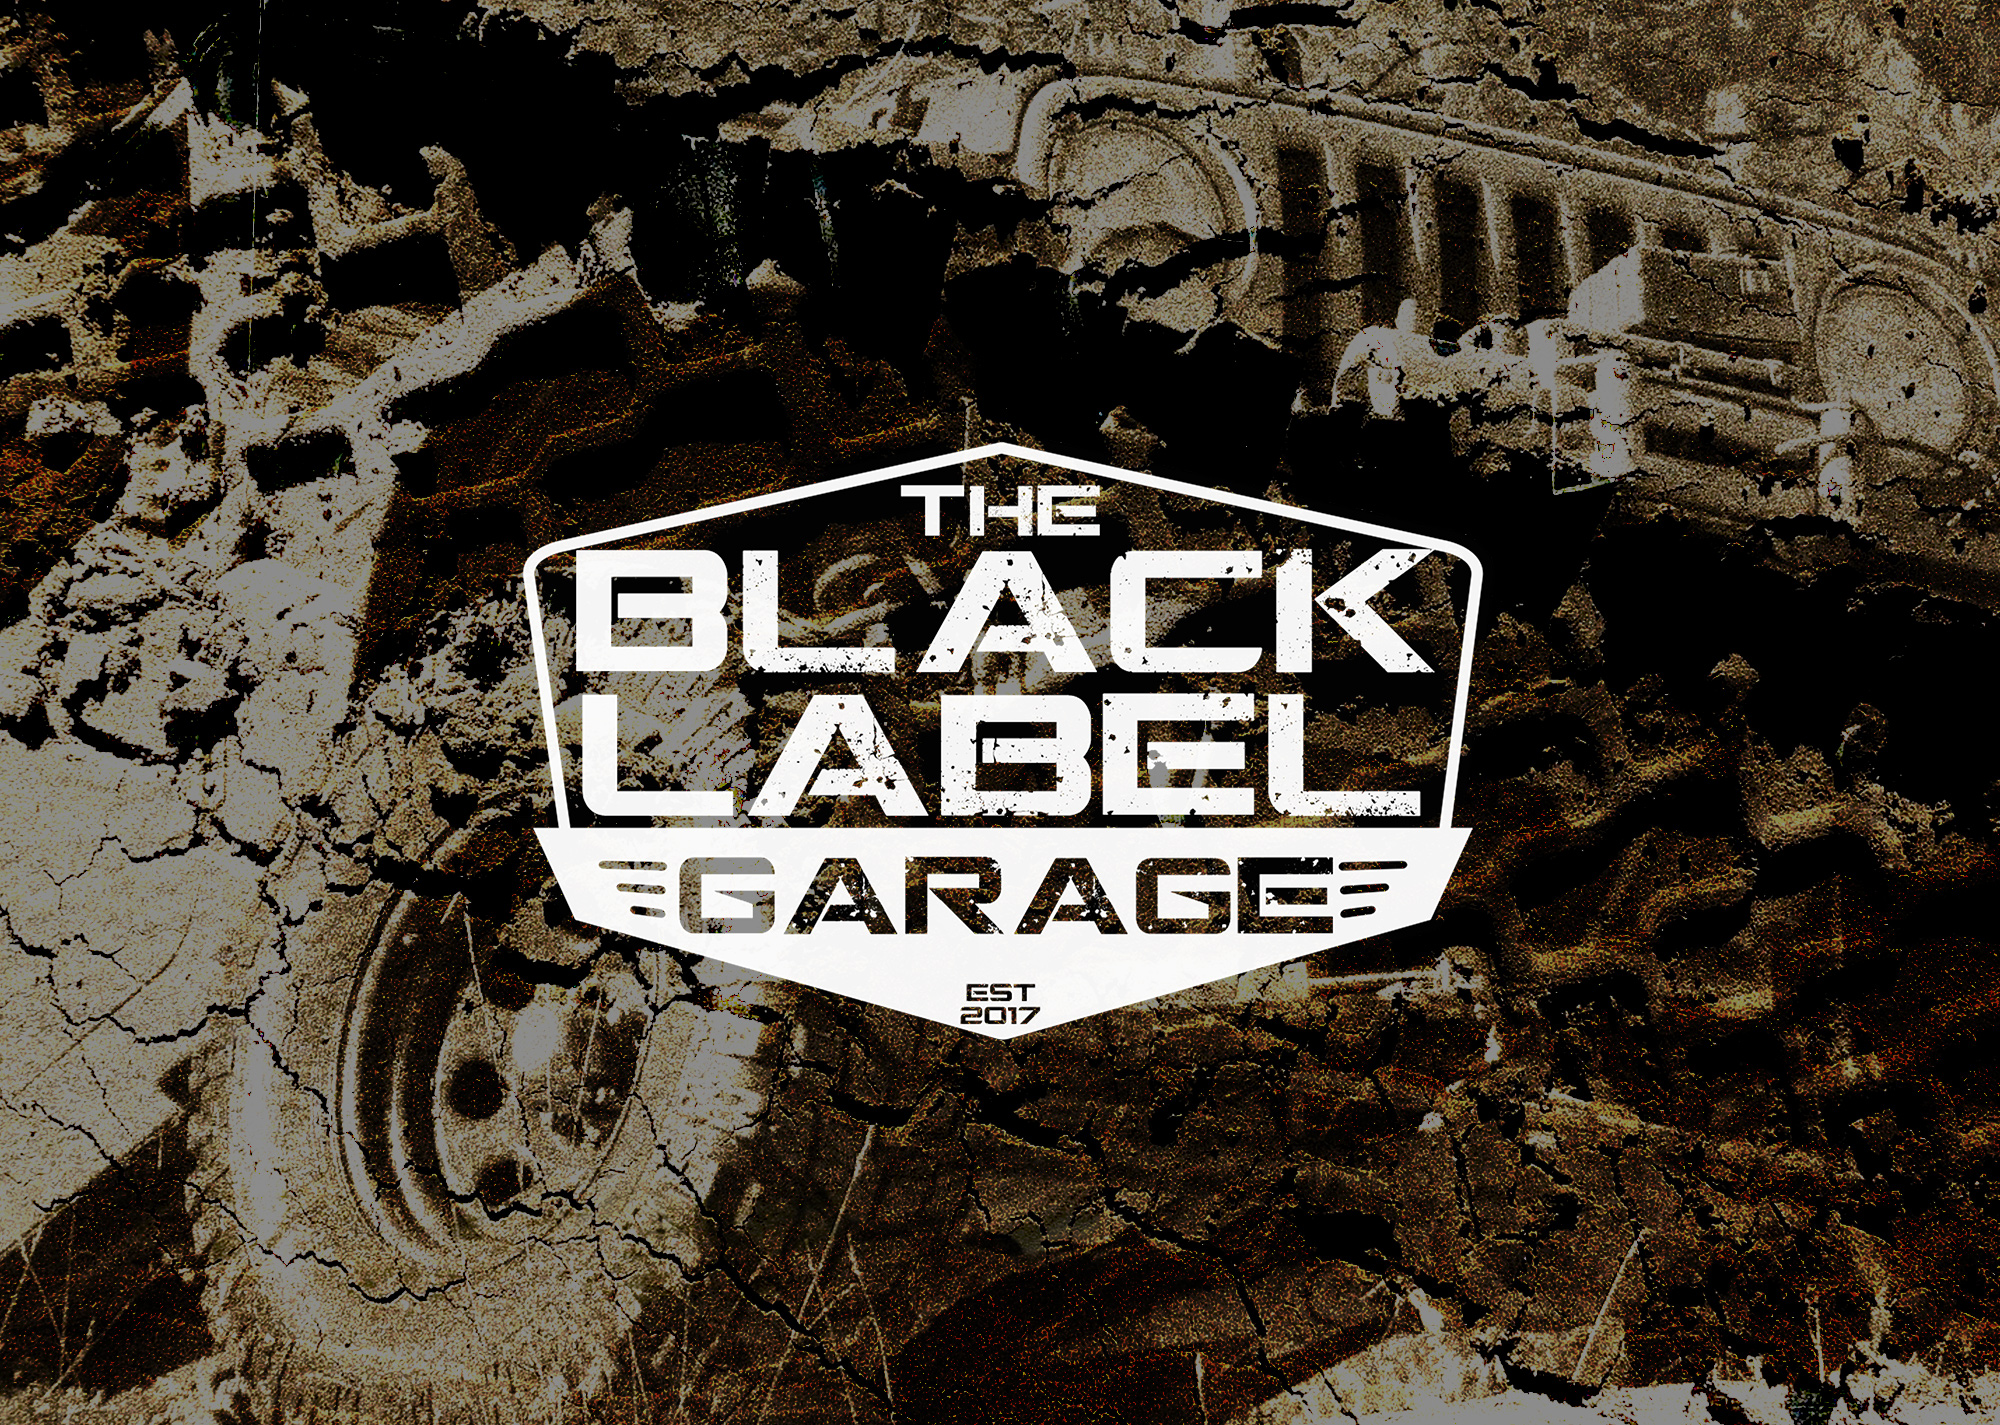 4xpedition black label garage